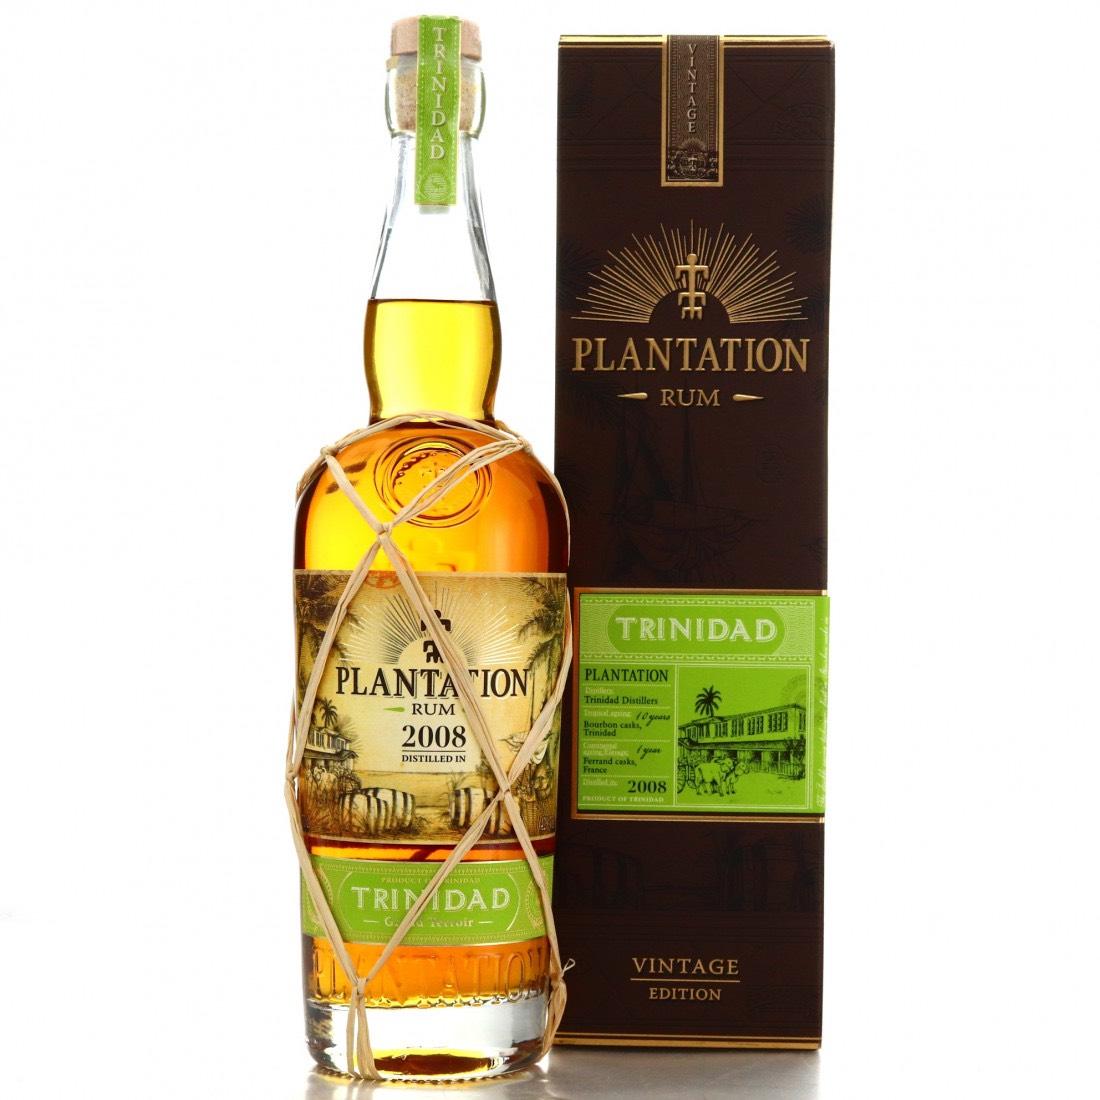 Bottle image of Plantation Trinidad Grand Terroir